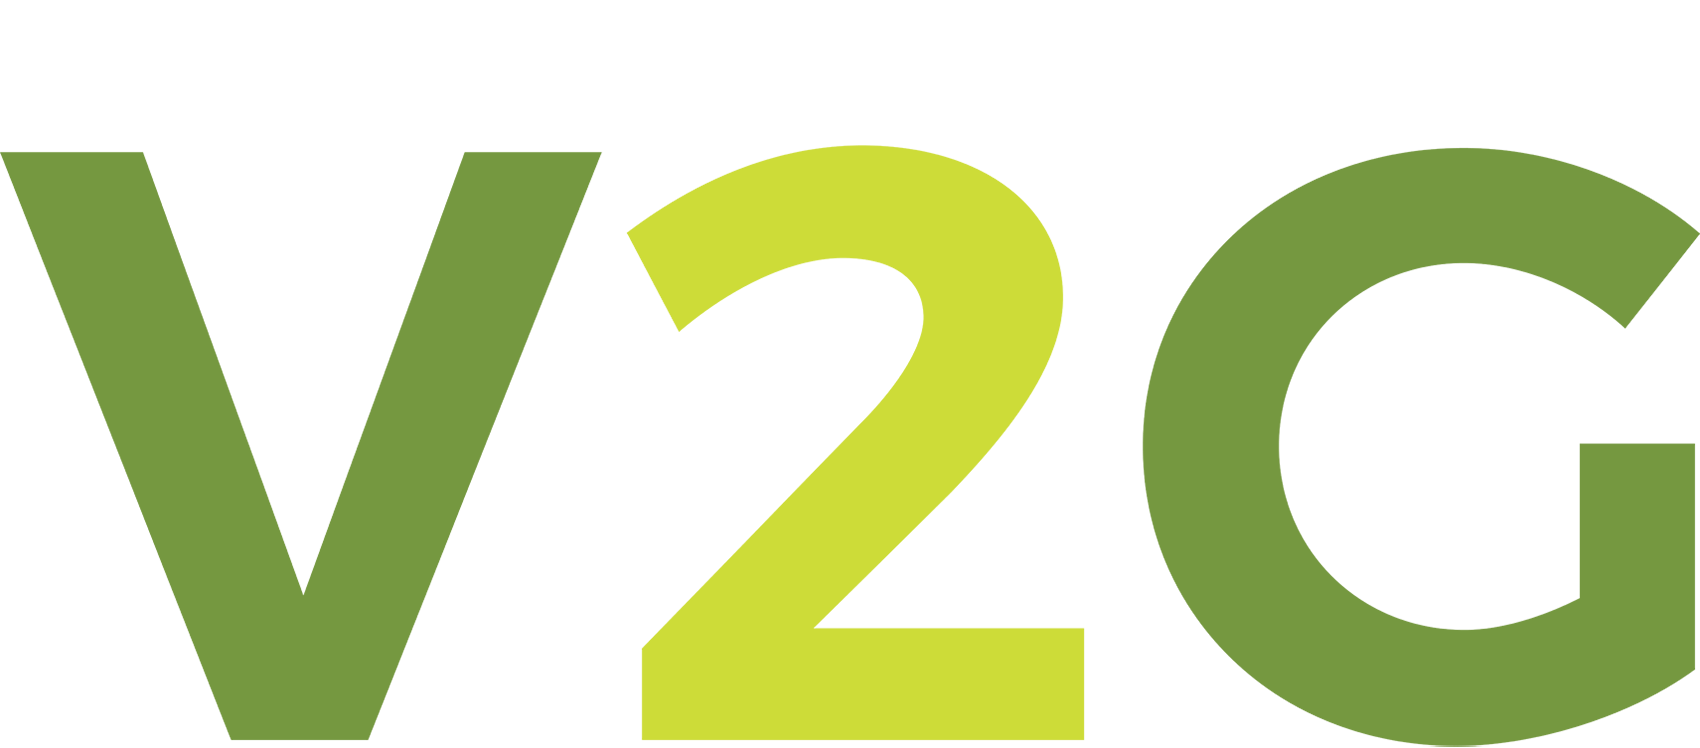 Vehicle To Grid (V2G) Innovation